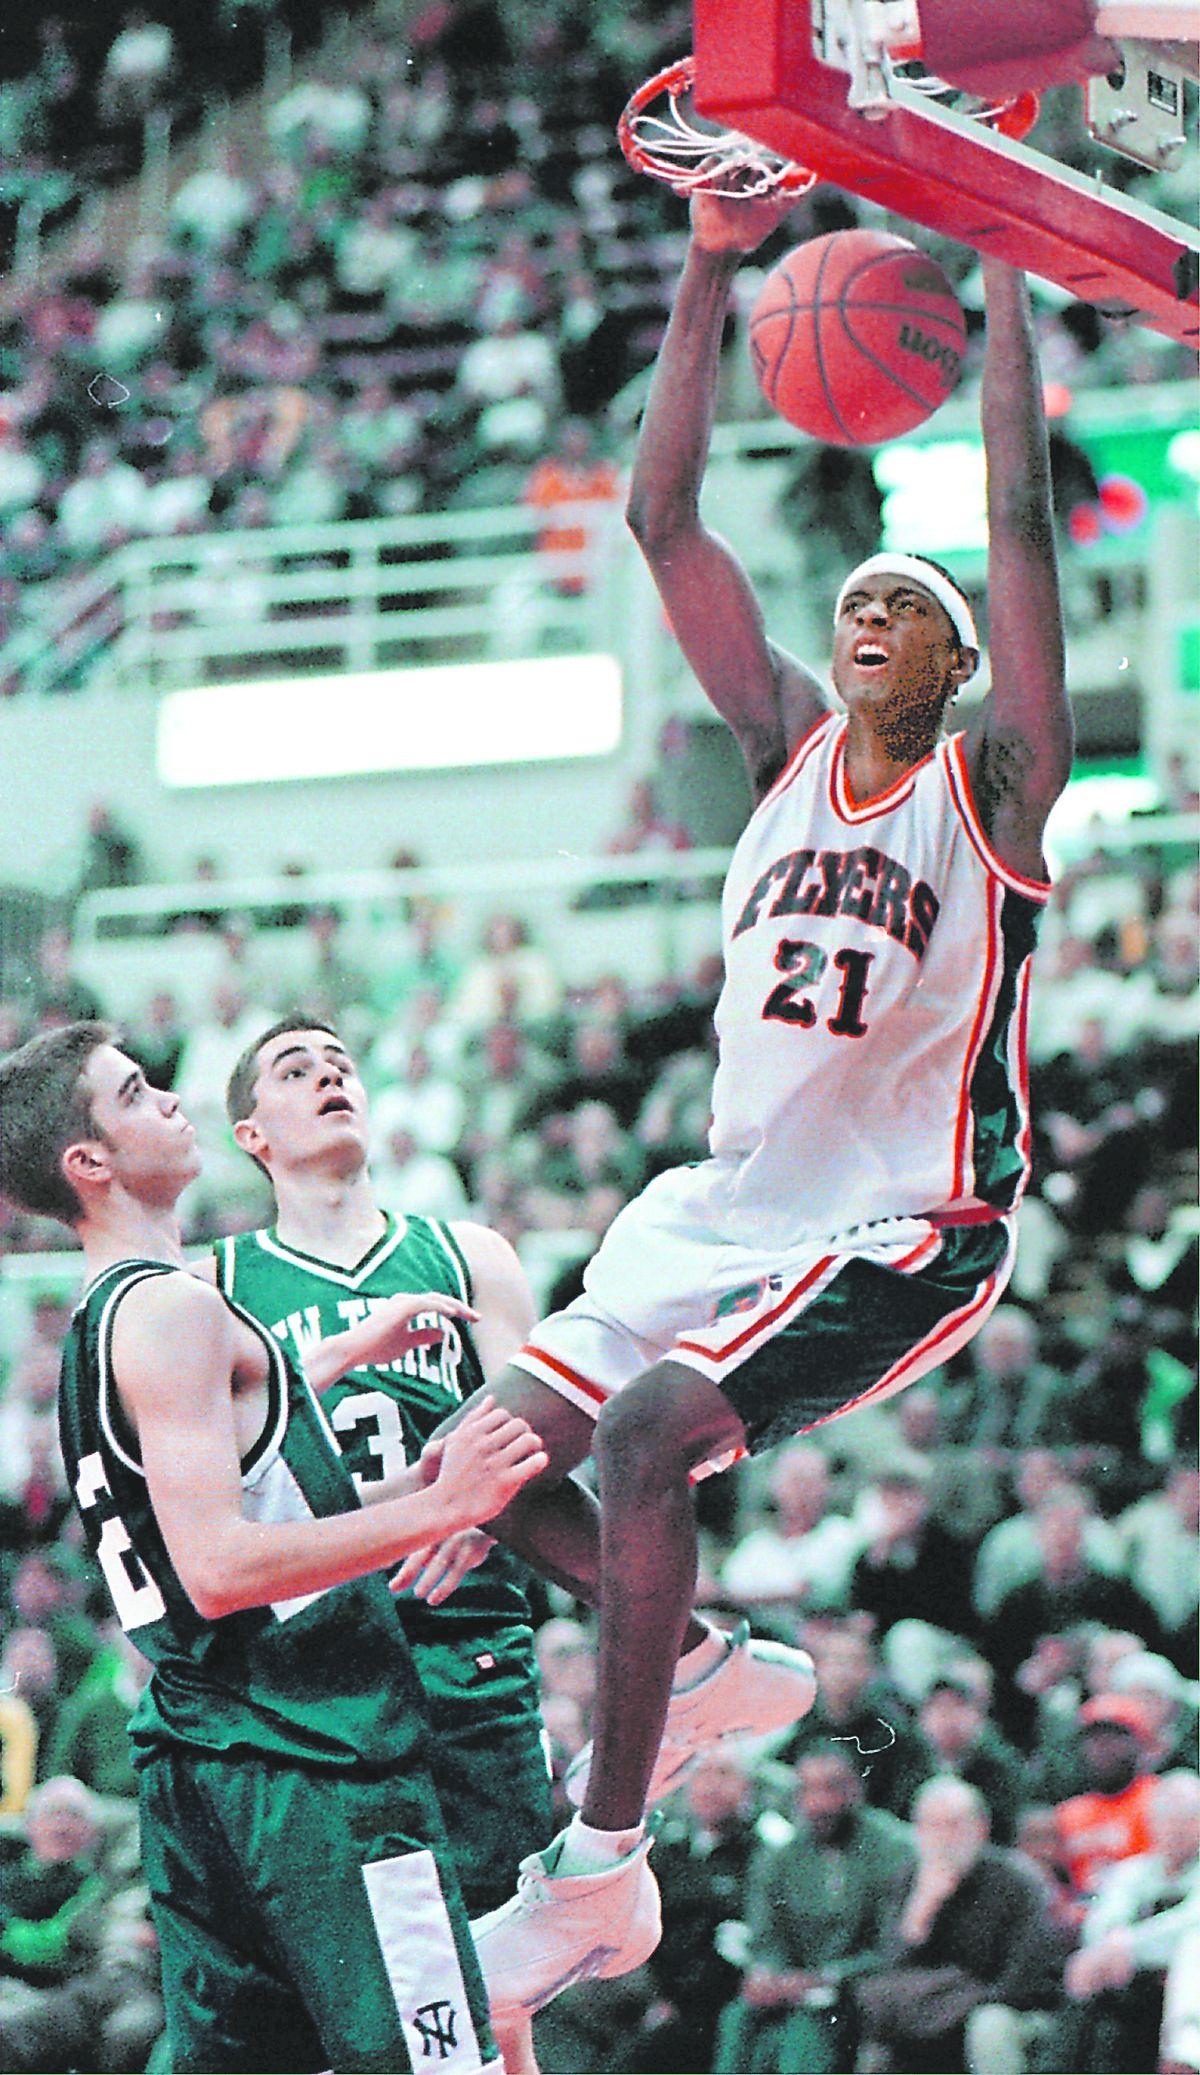 East St. Louis center Darius Miles dunks against New Trier.